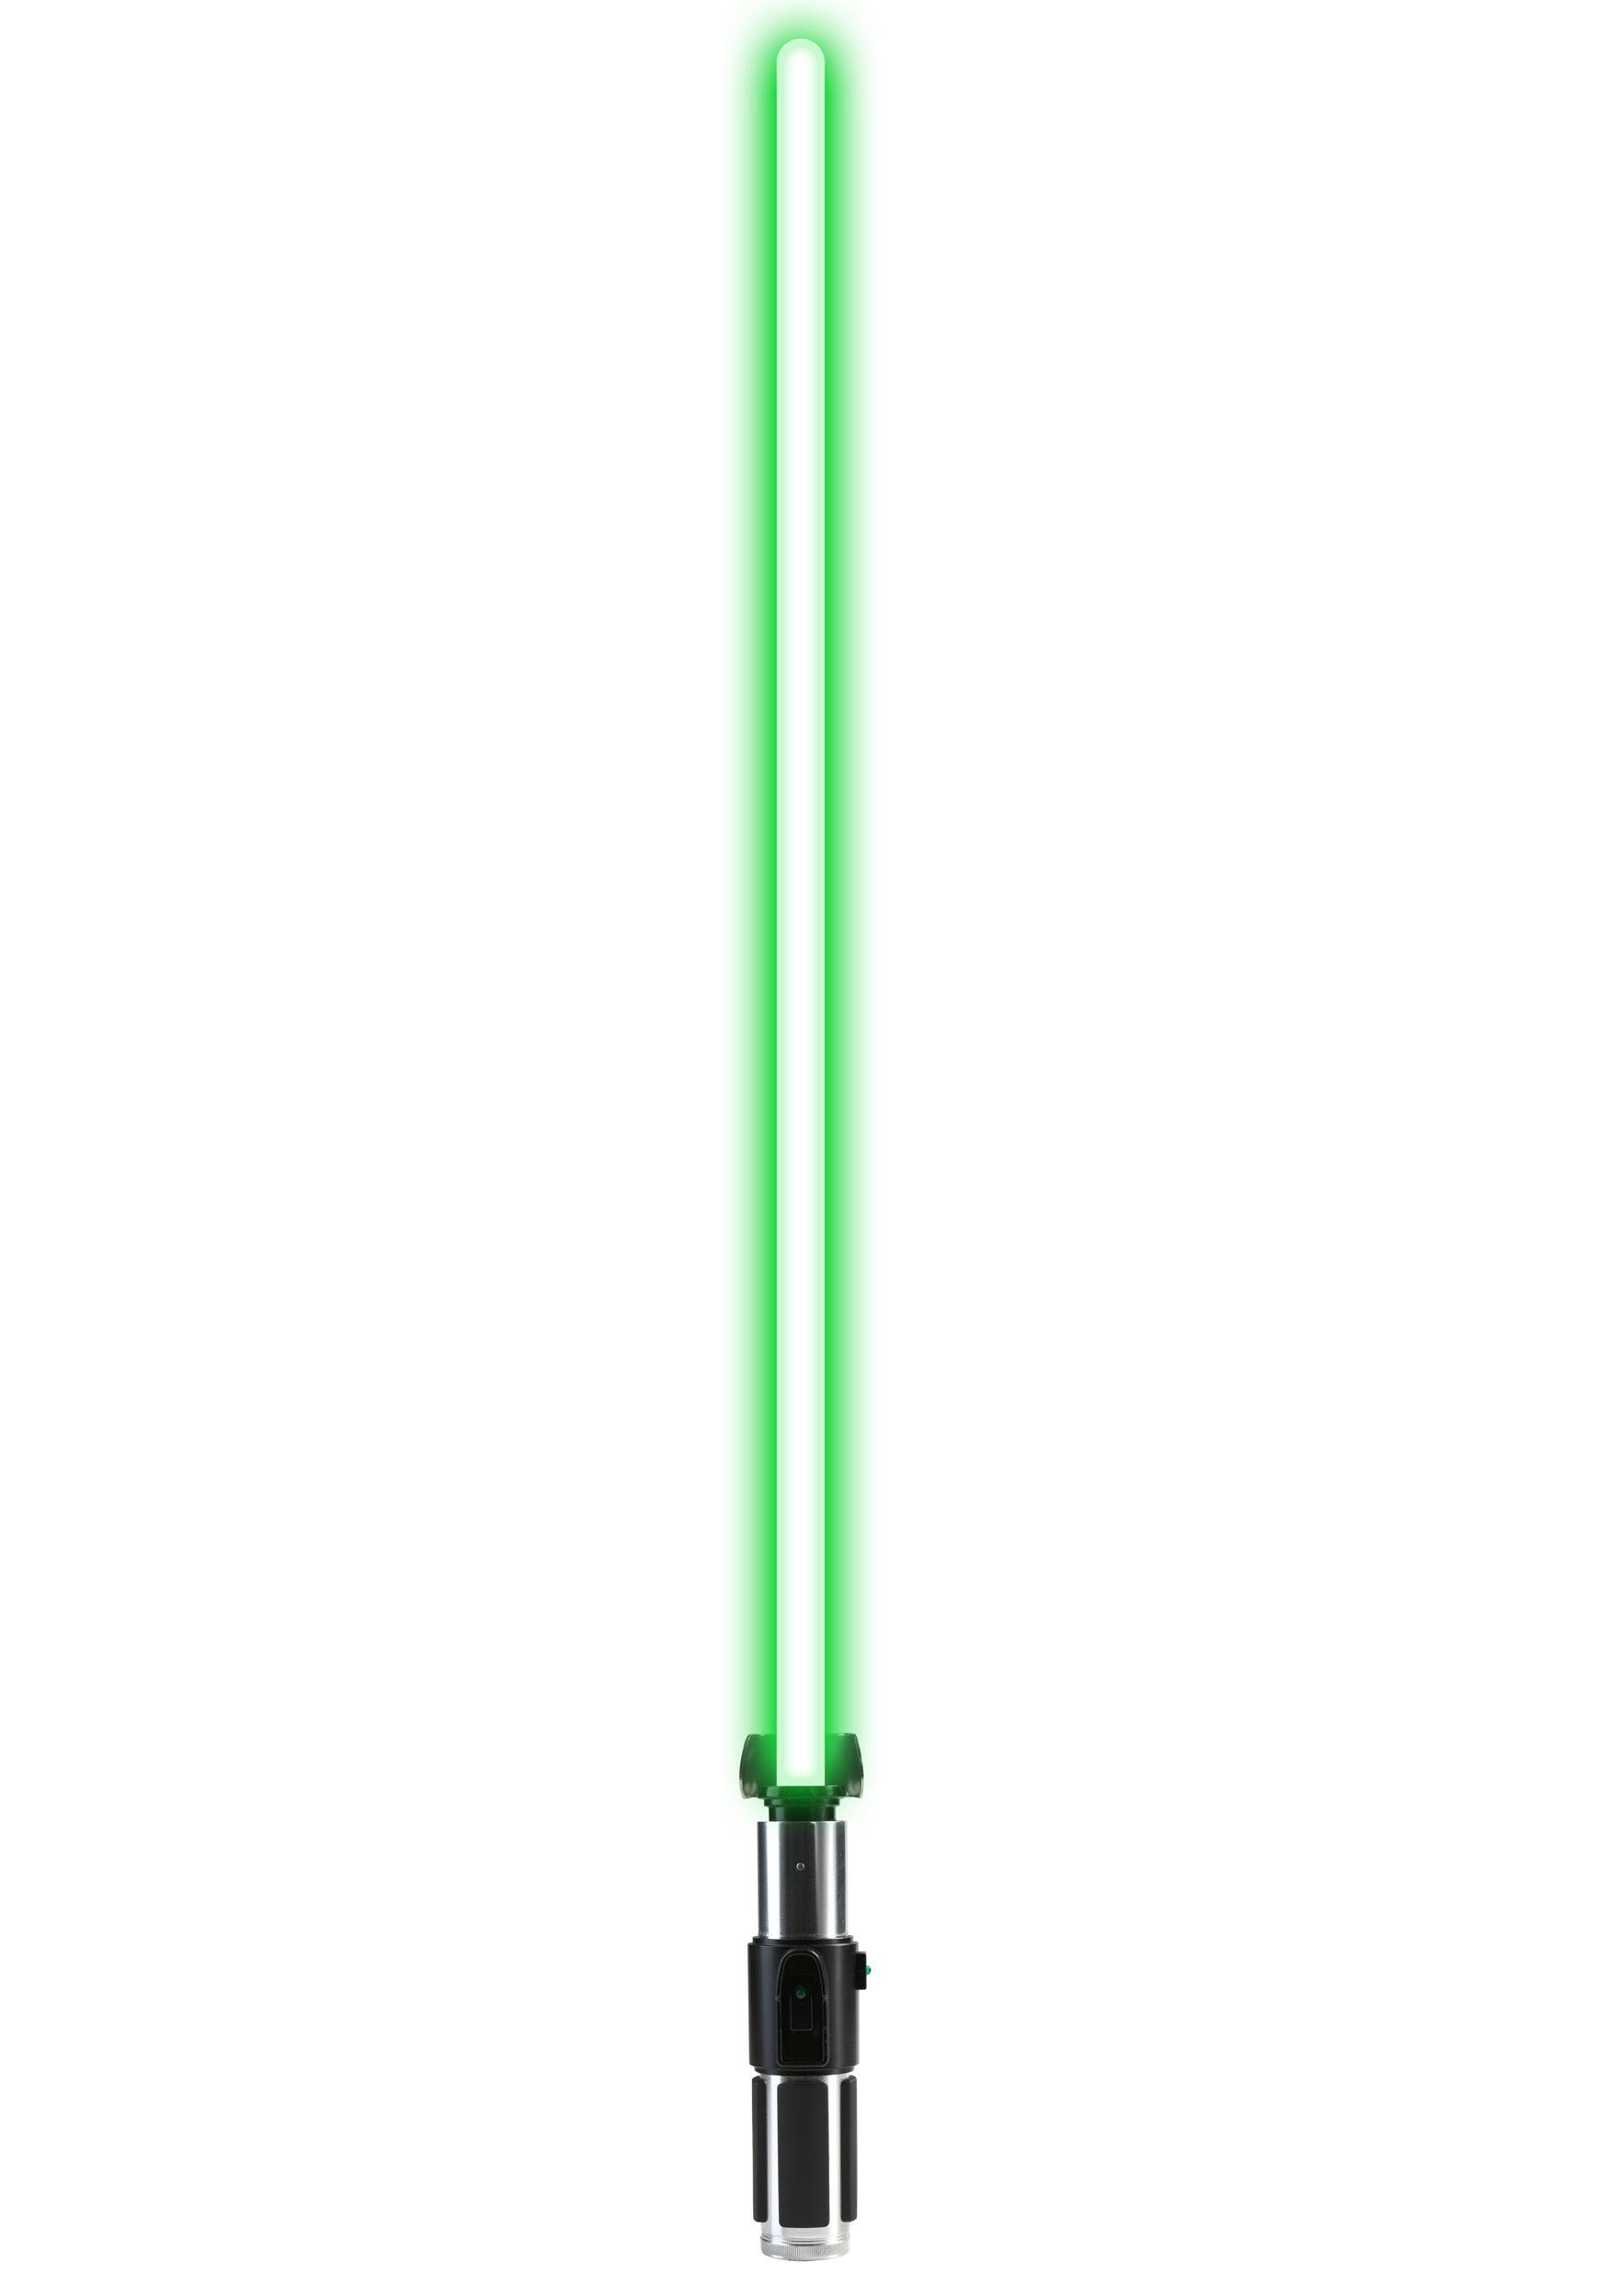 Star Wars Yoda Deluxe Force FX Lightsaber EEDYODA